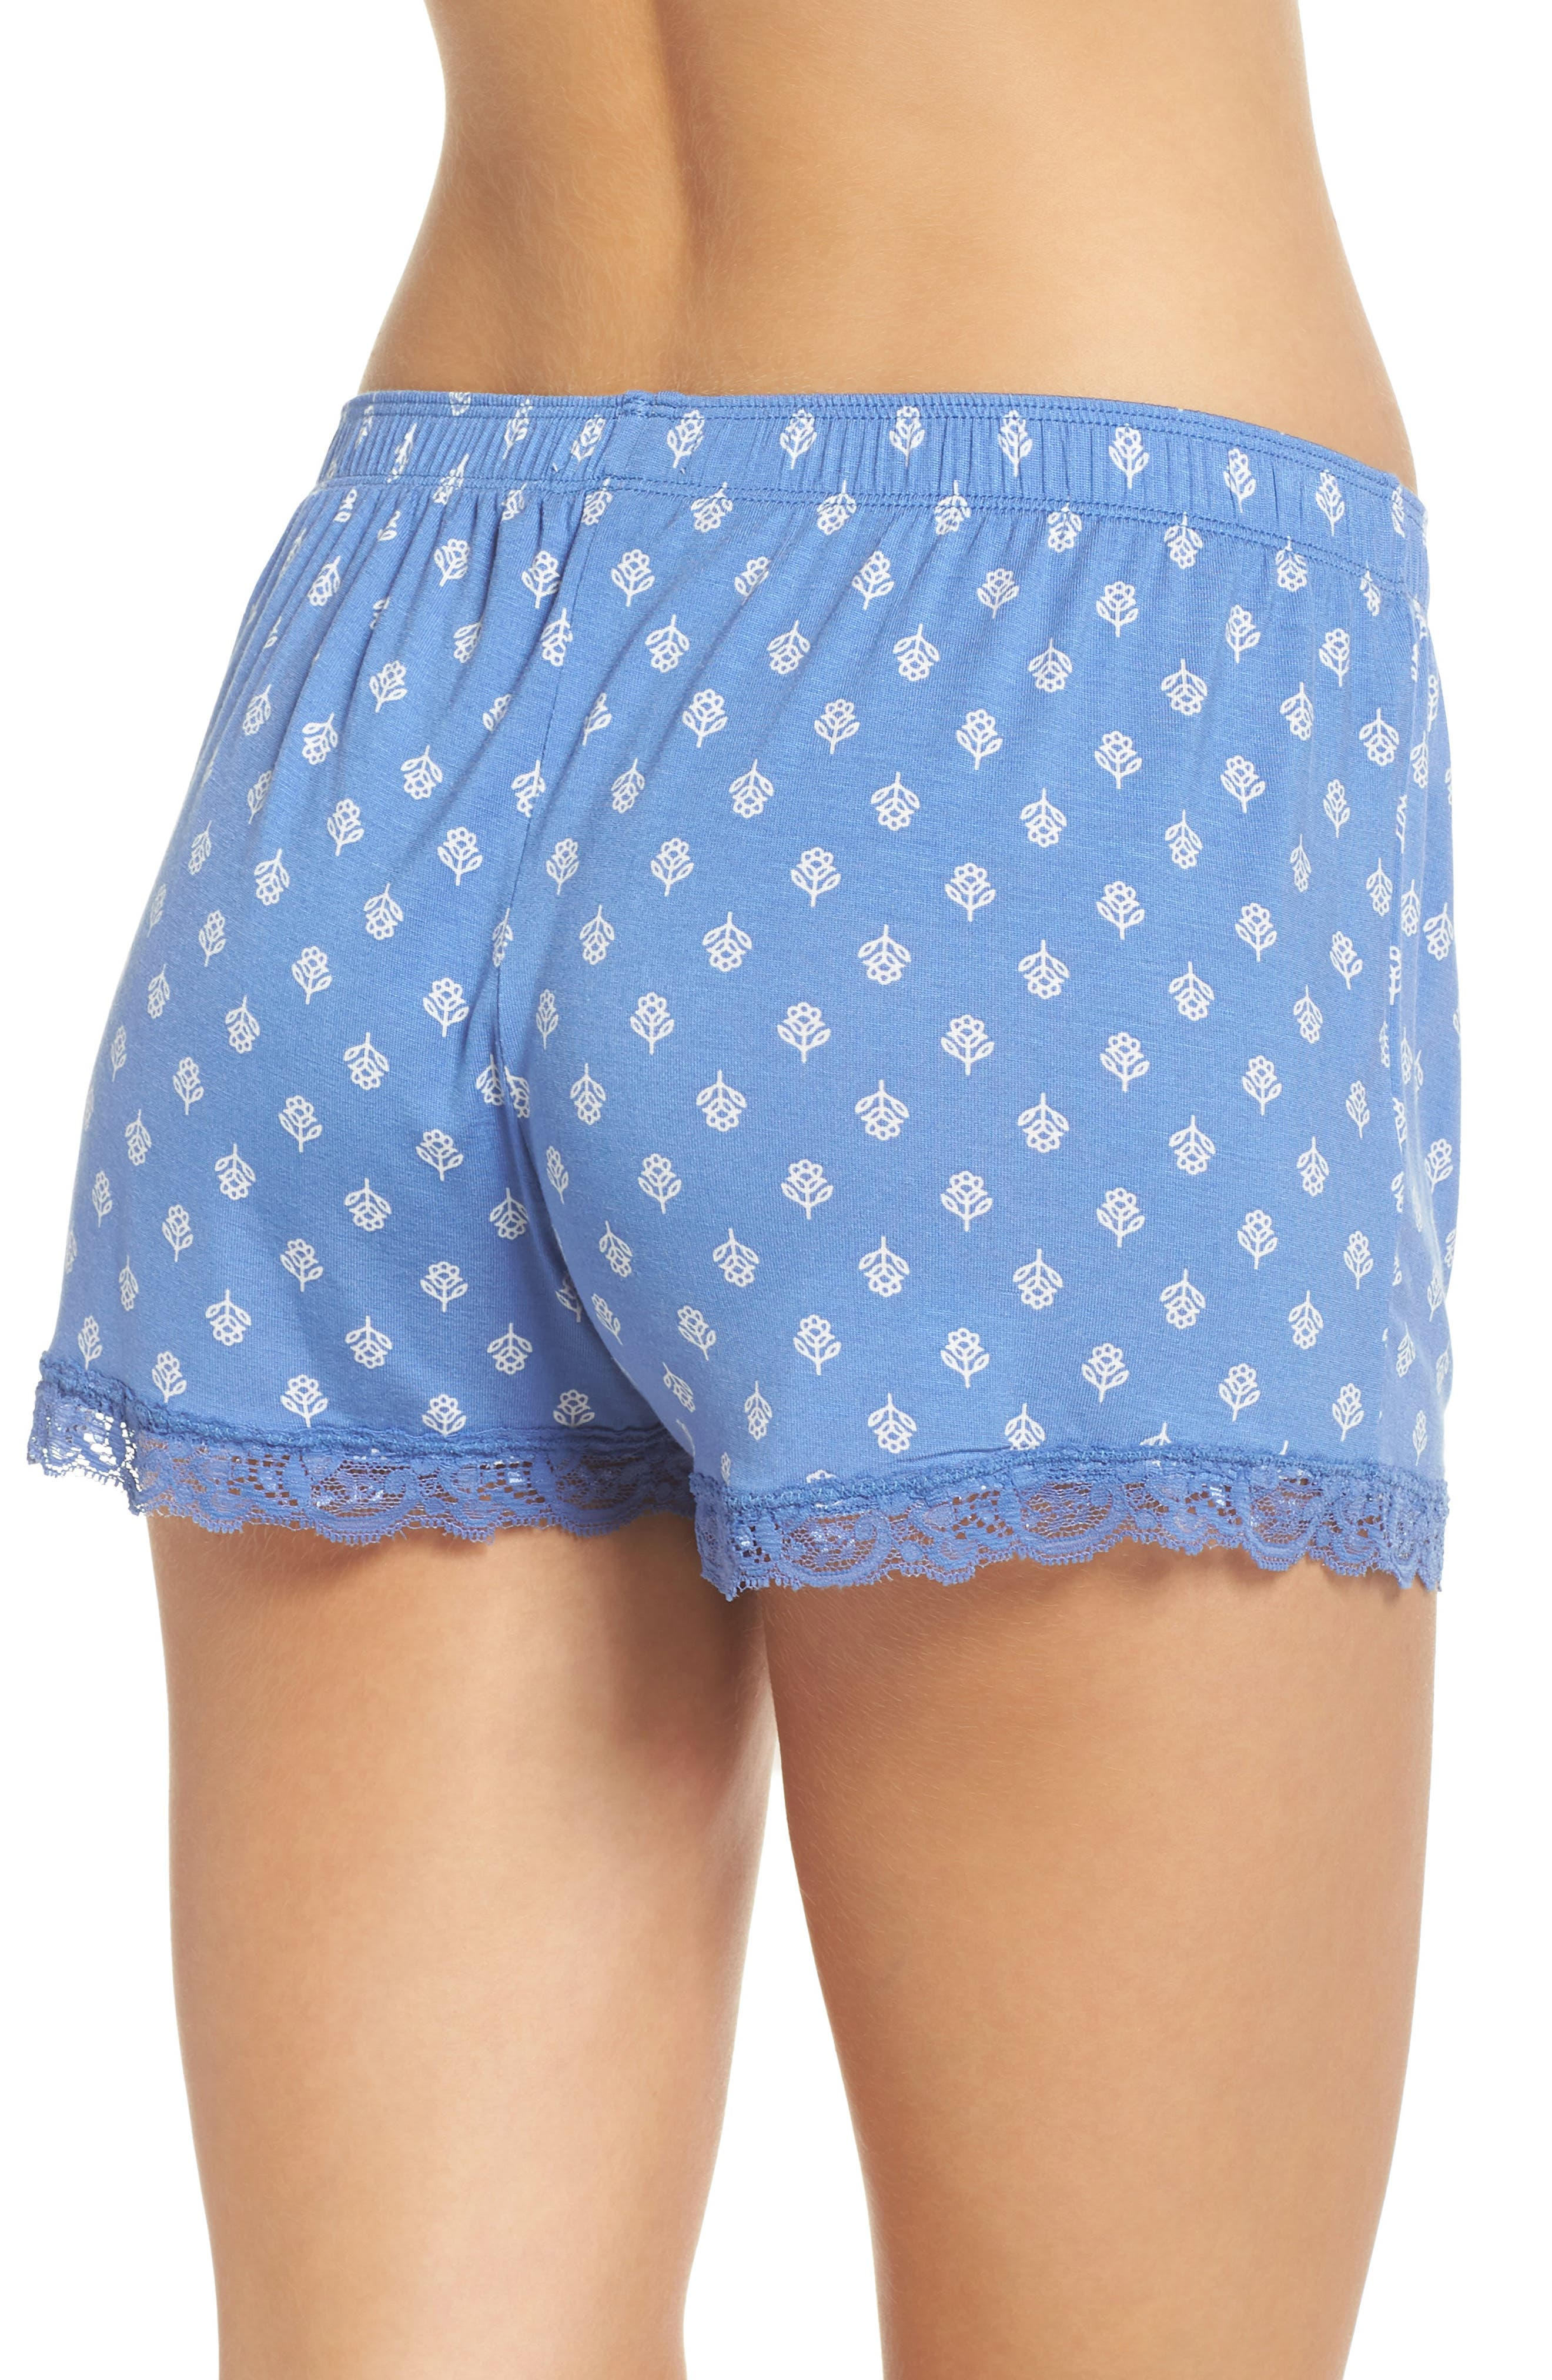 Pajama Shorts,                             Alternate thumbnail 2, color,                             Blue